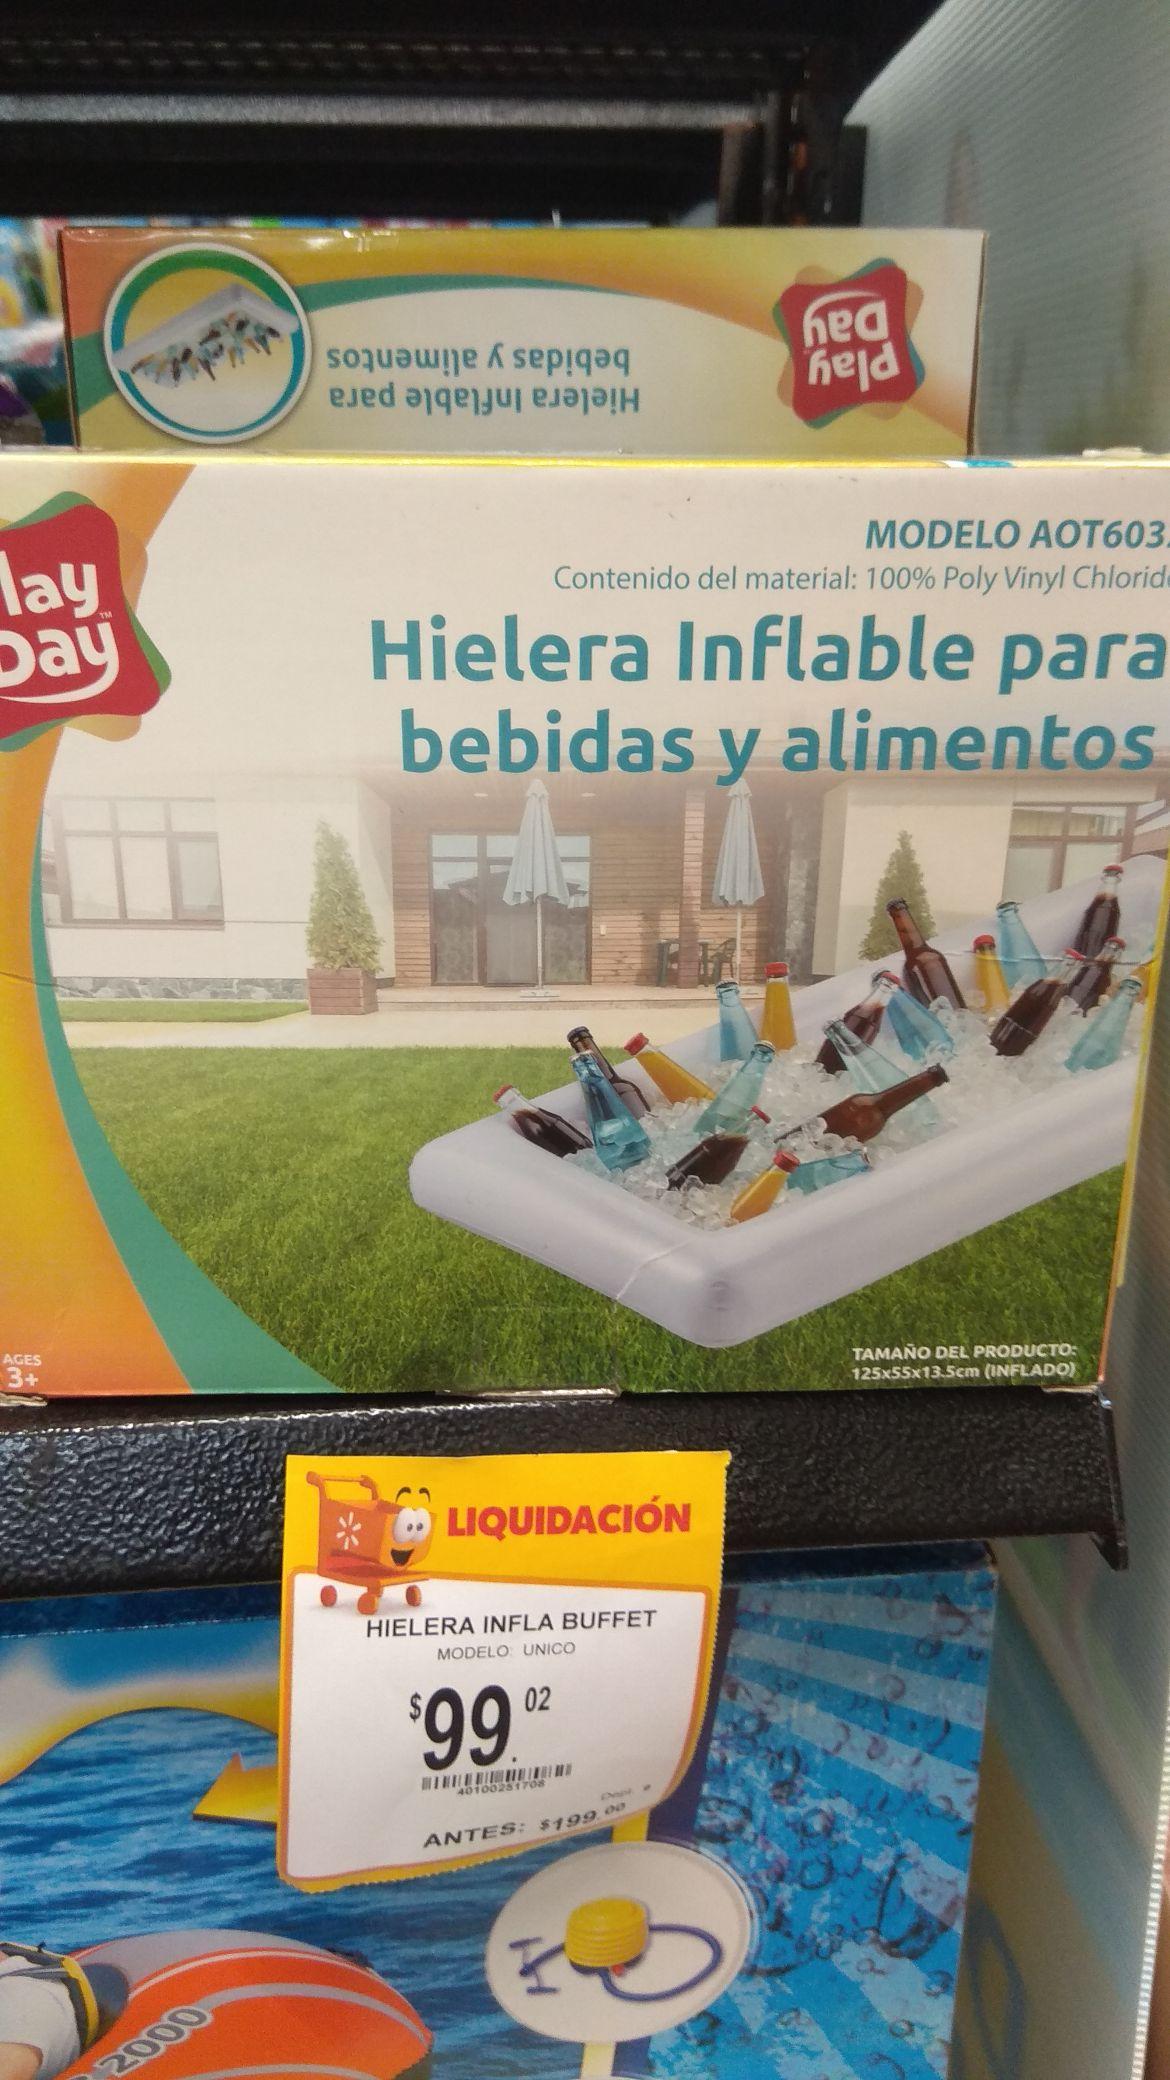 Walmart: Hielera inflable en 2da. Liquidación